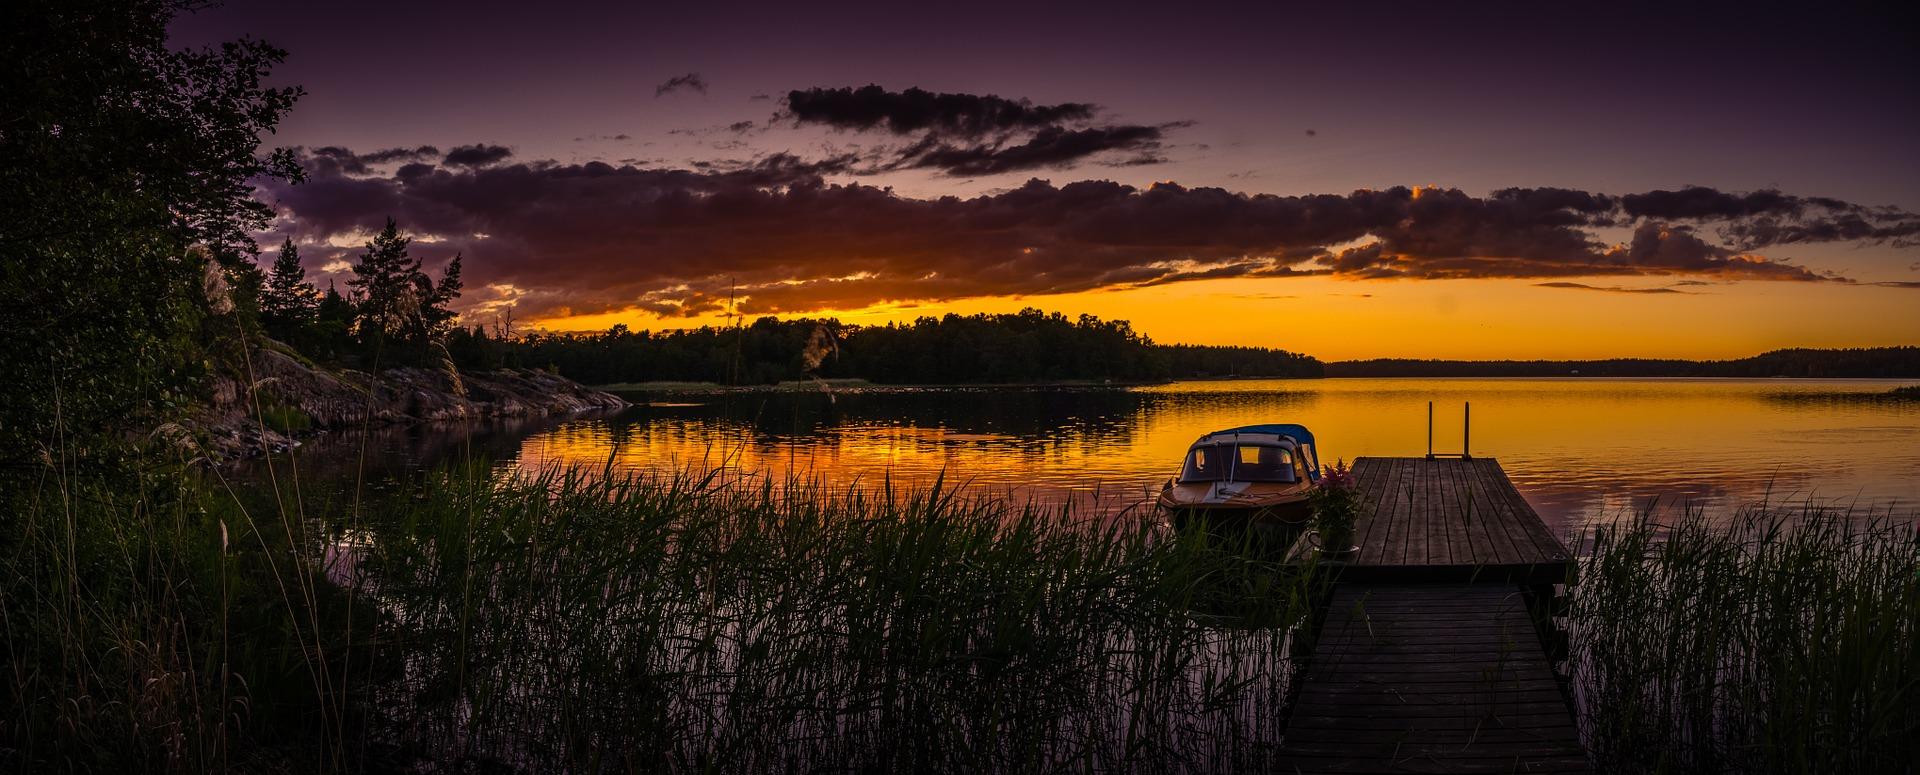 sunset-1283305_1920